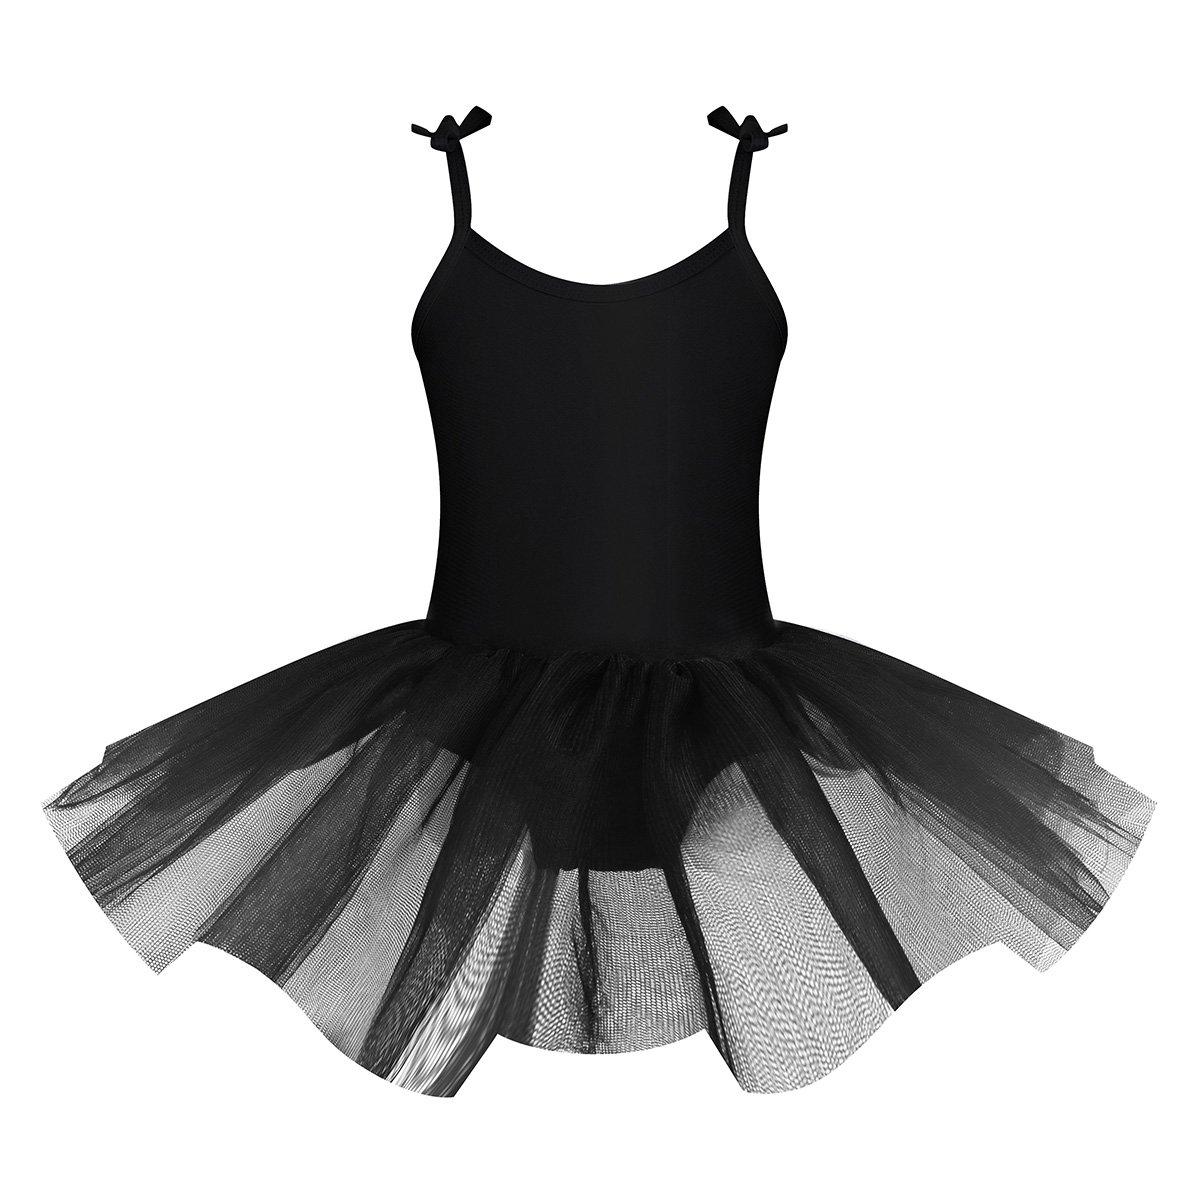 iEFiEL Vestido Maillot de Ballet Danza Con Tutú Falda Sin Manga para Niña Actuación Fiesta